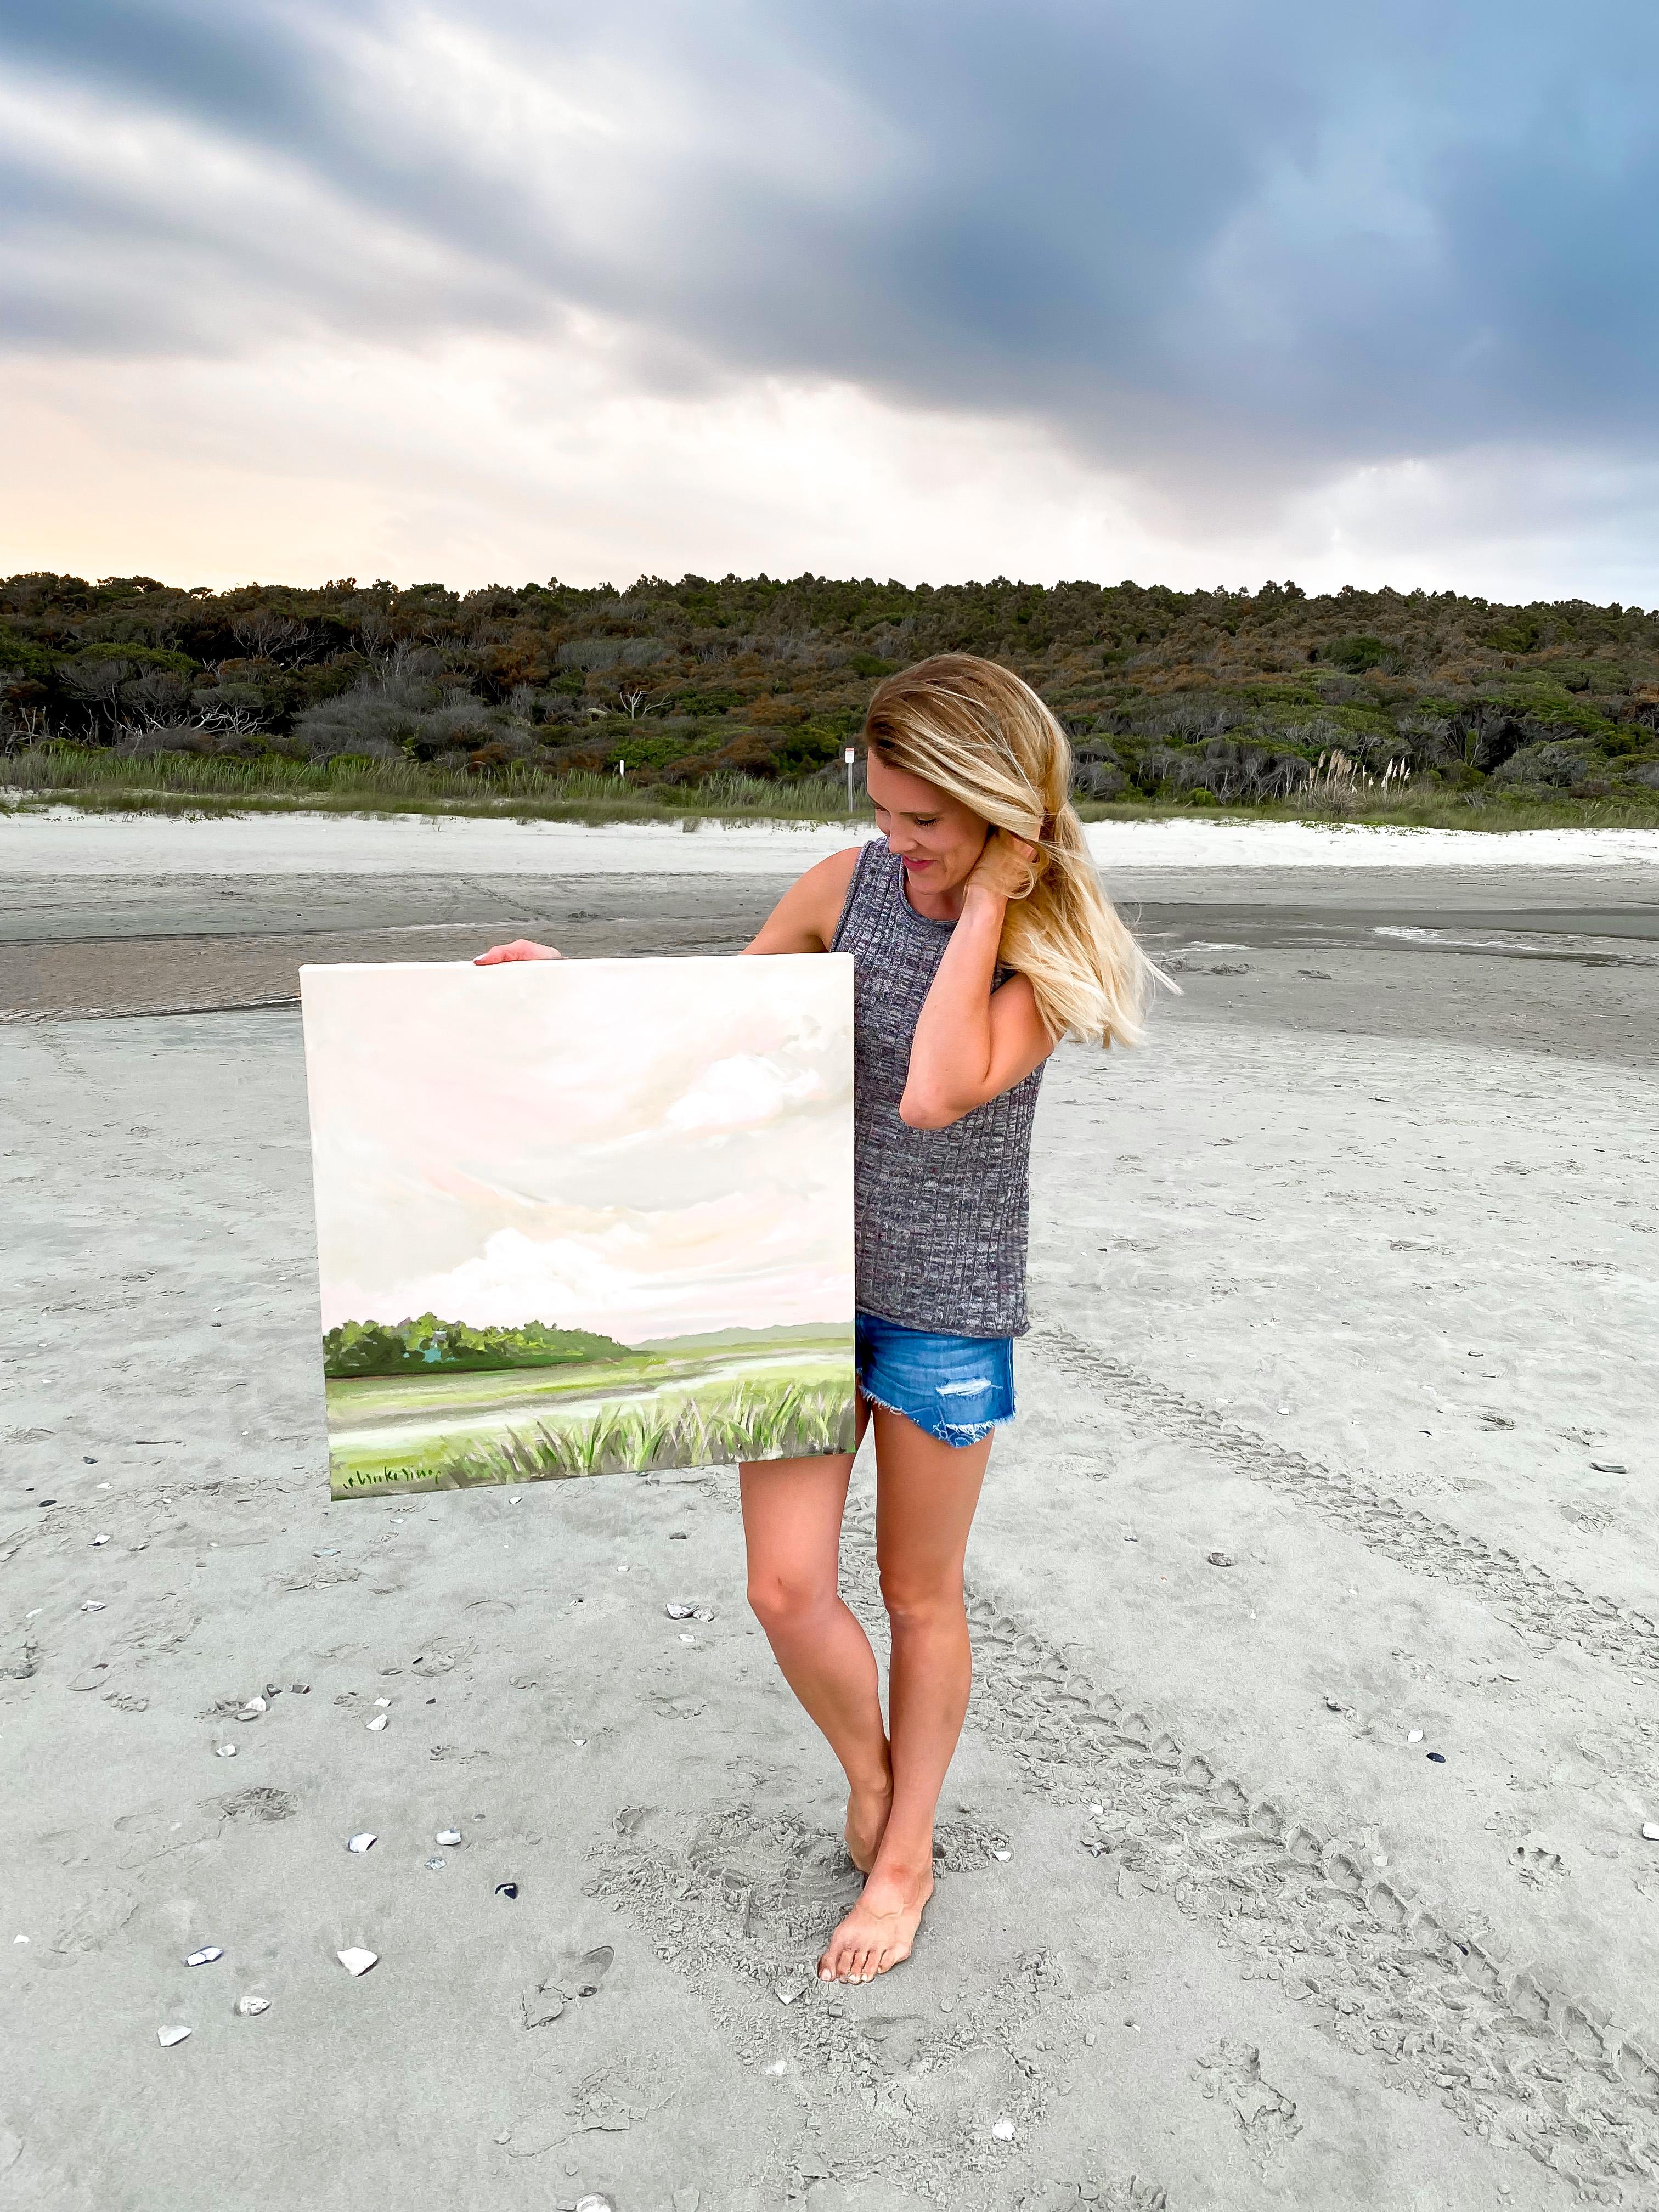 New Marsh Paintings Coming September 30!